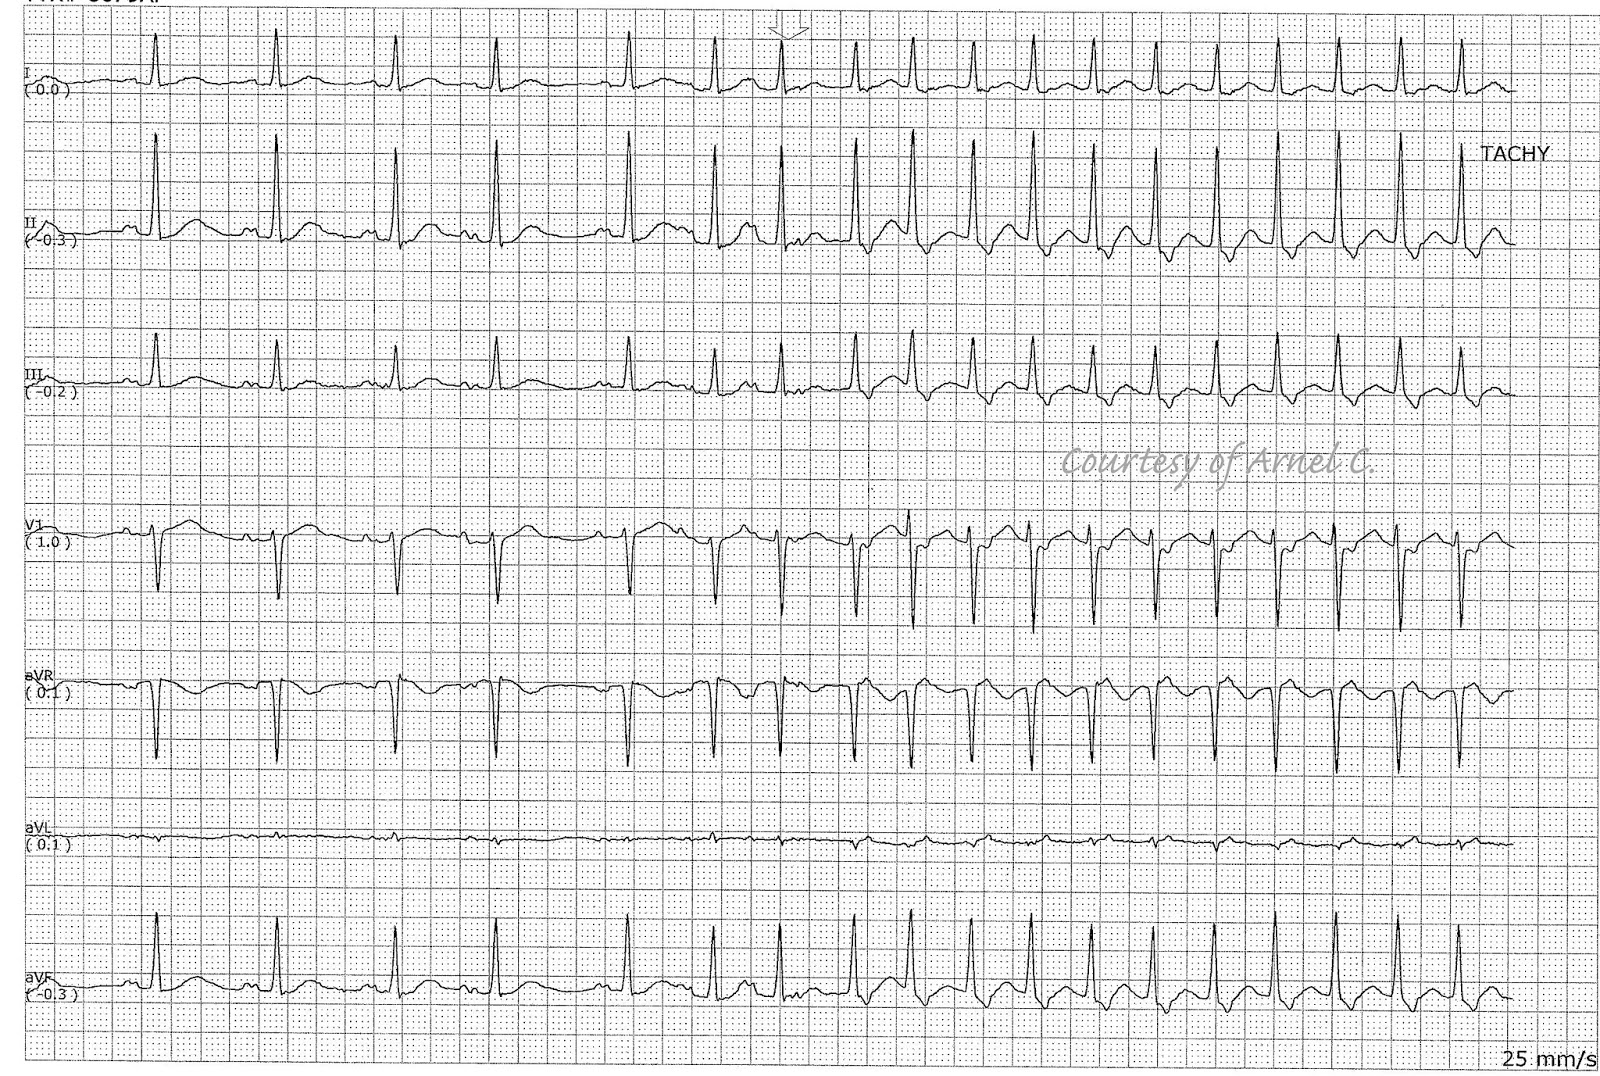 ecg rhythms  atrial arrhythmia triggering avnrt